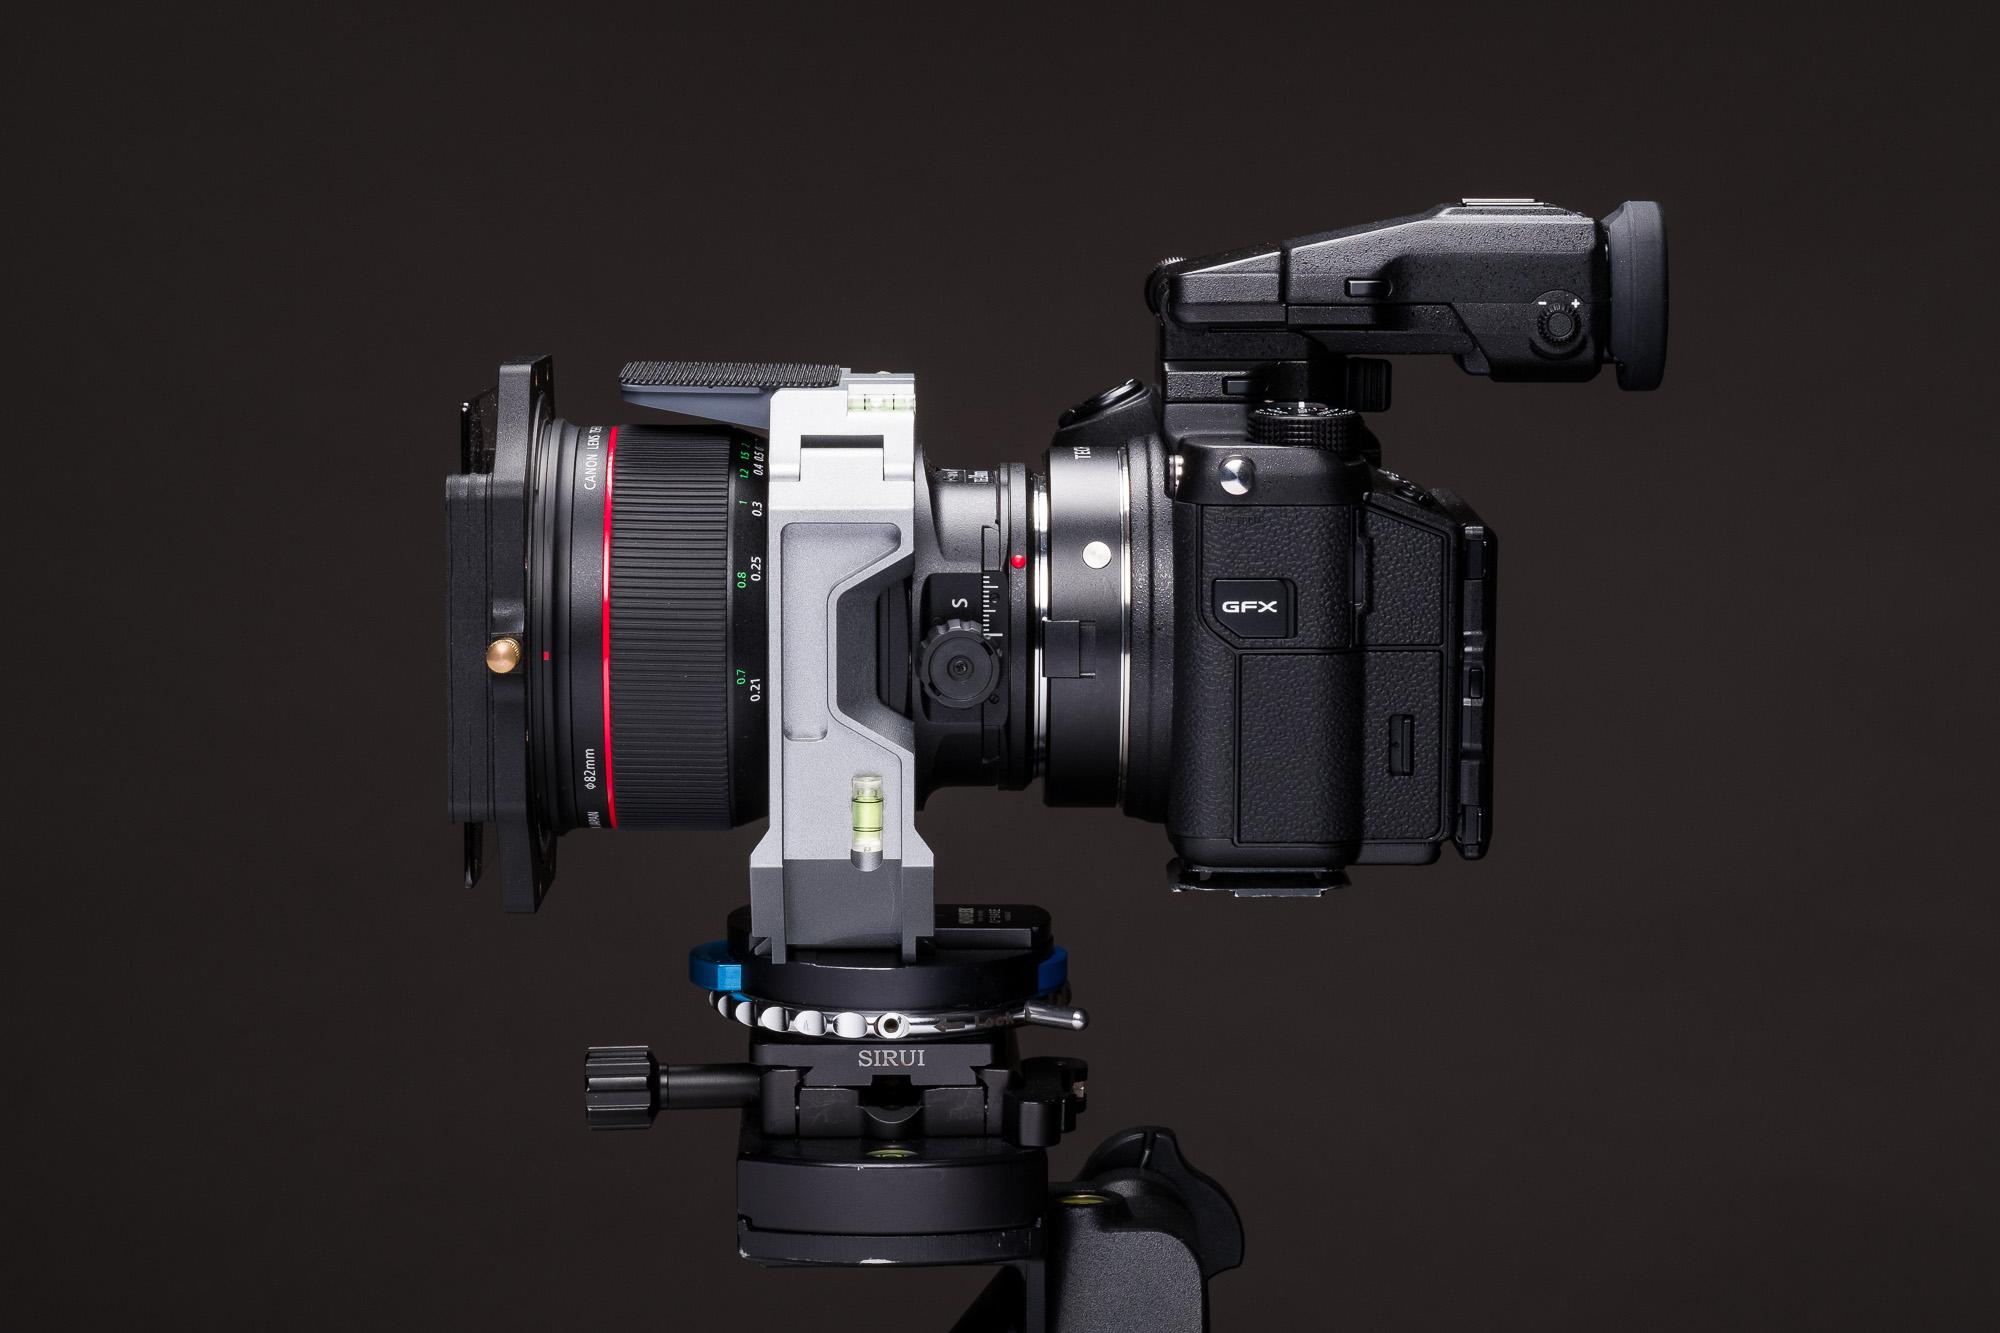 Architectural Photography with Fujifilm GFX50S & Canon 24 TS-E • Lightforge Photography